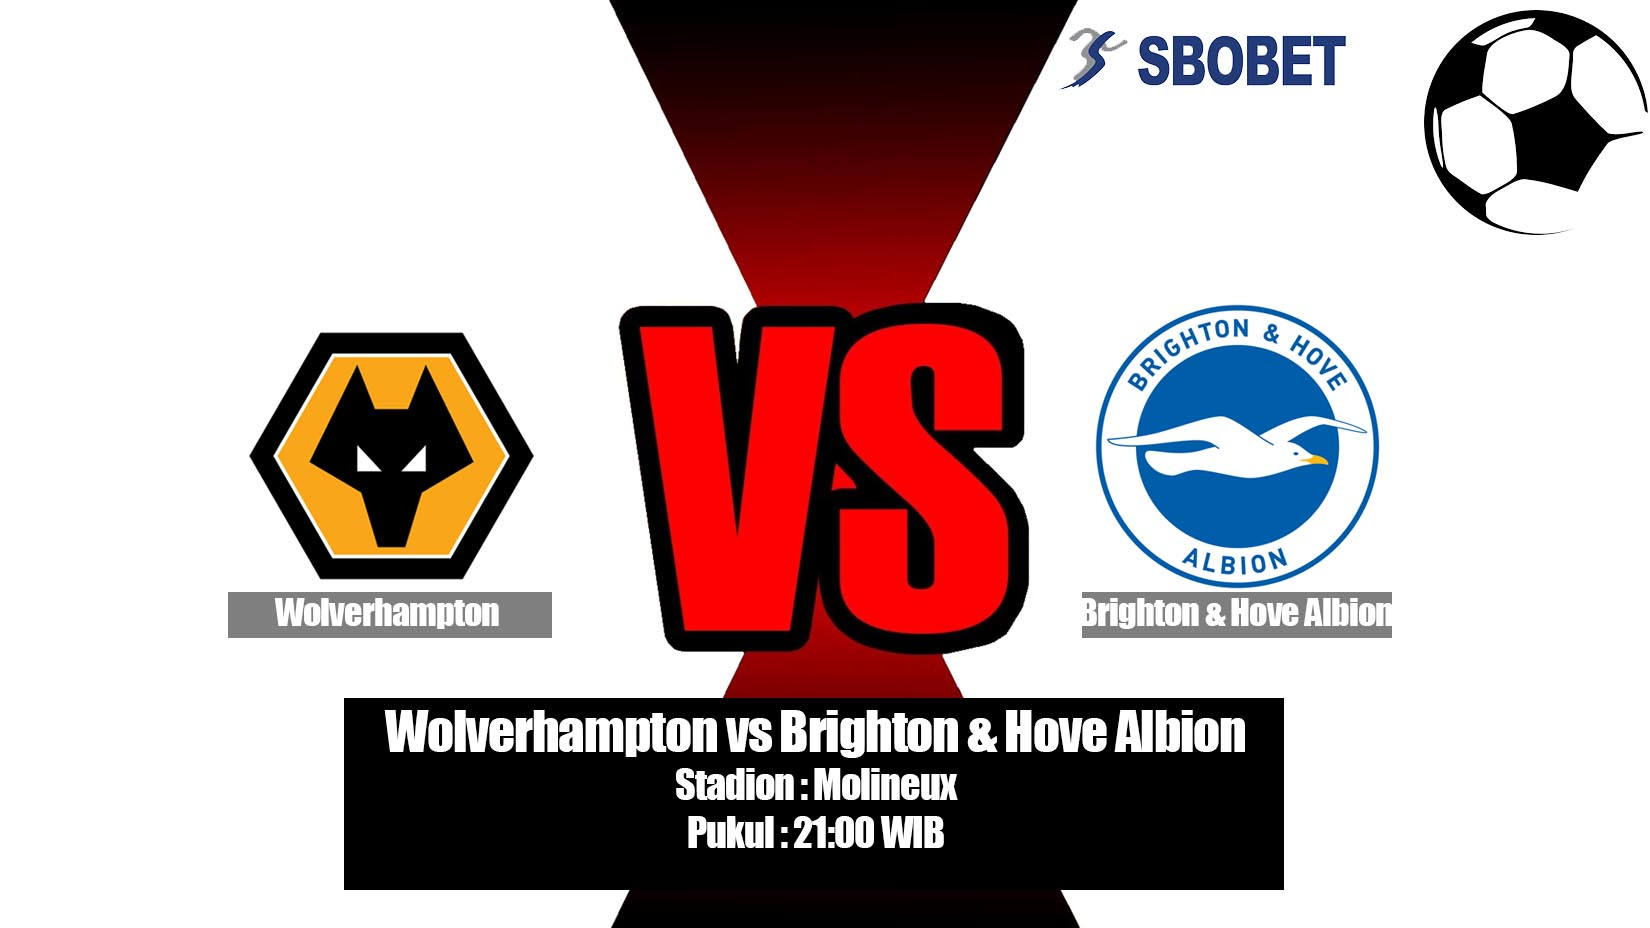 Prediksi Bola Wolverhampton vs Brighton & Hove Albion 20 April 2019